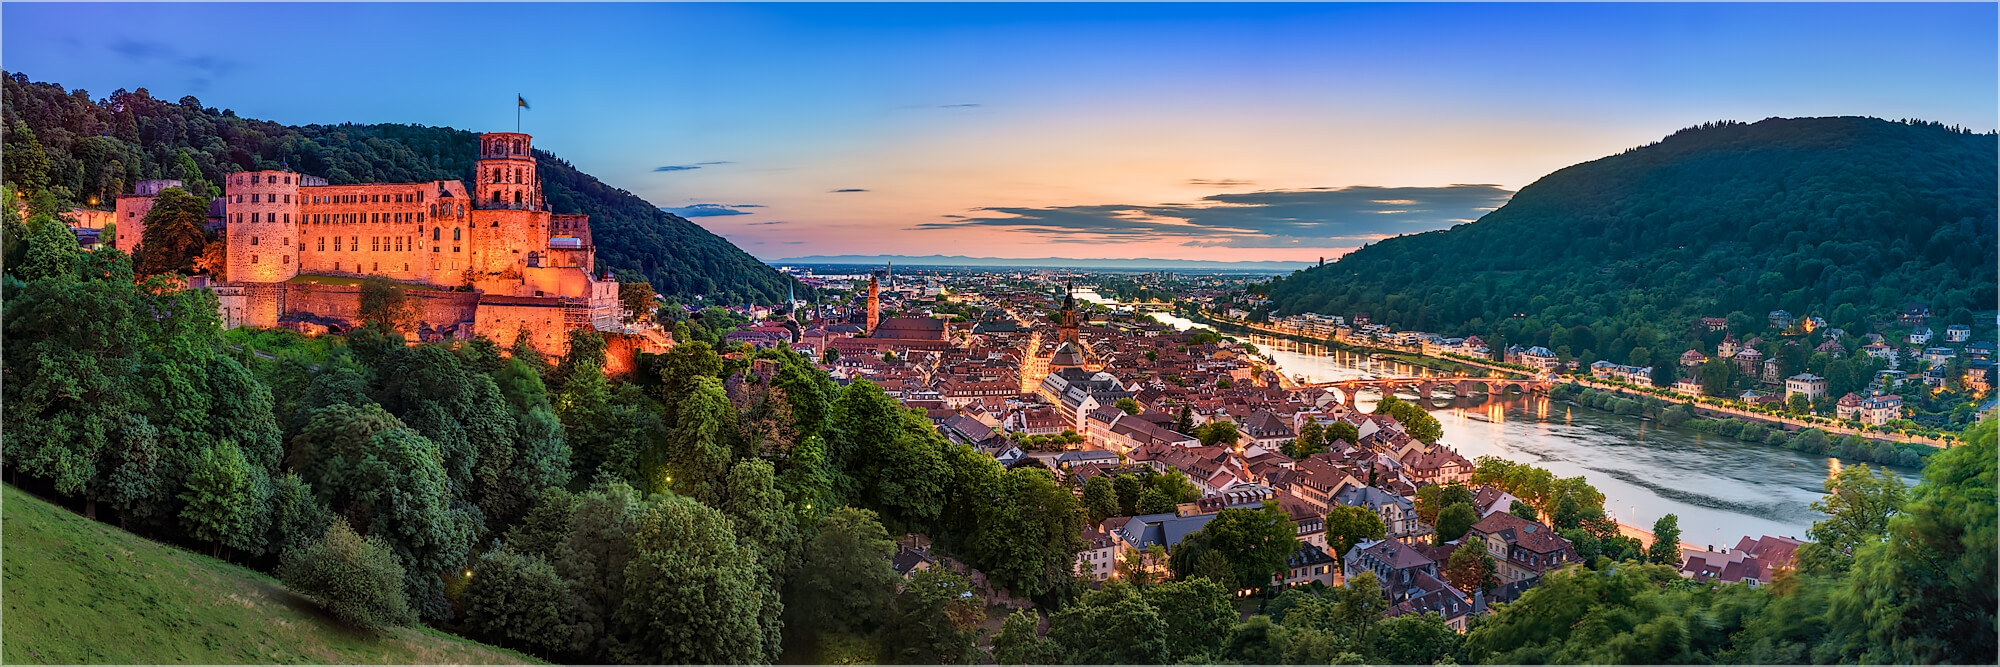 Panoramafoto Heidelberg nach dem Sonnenuntergang